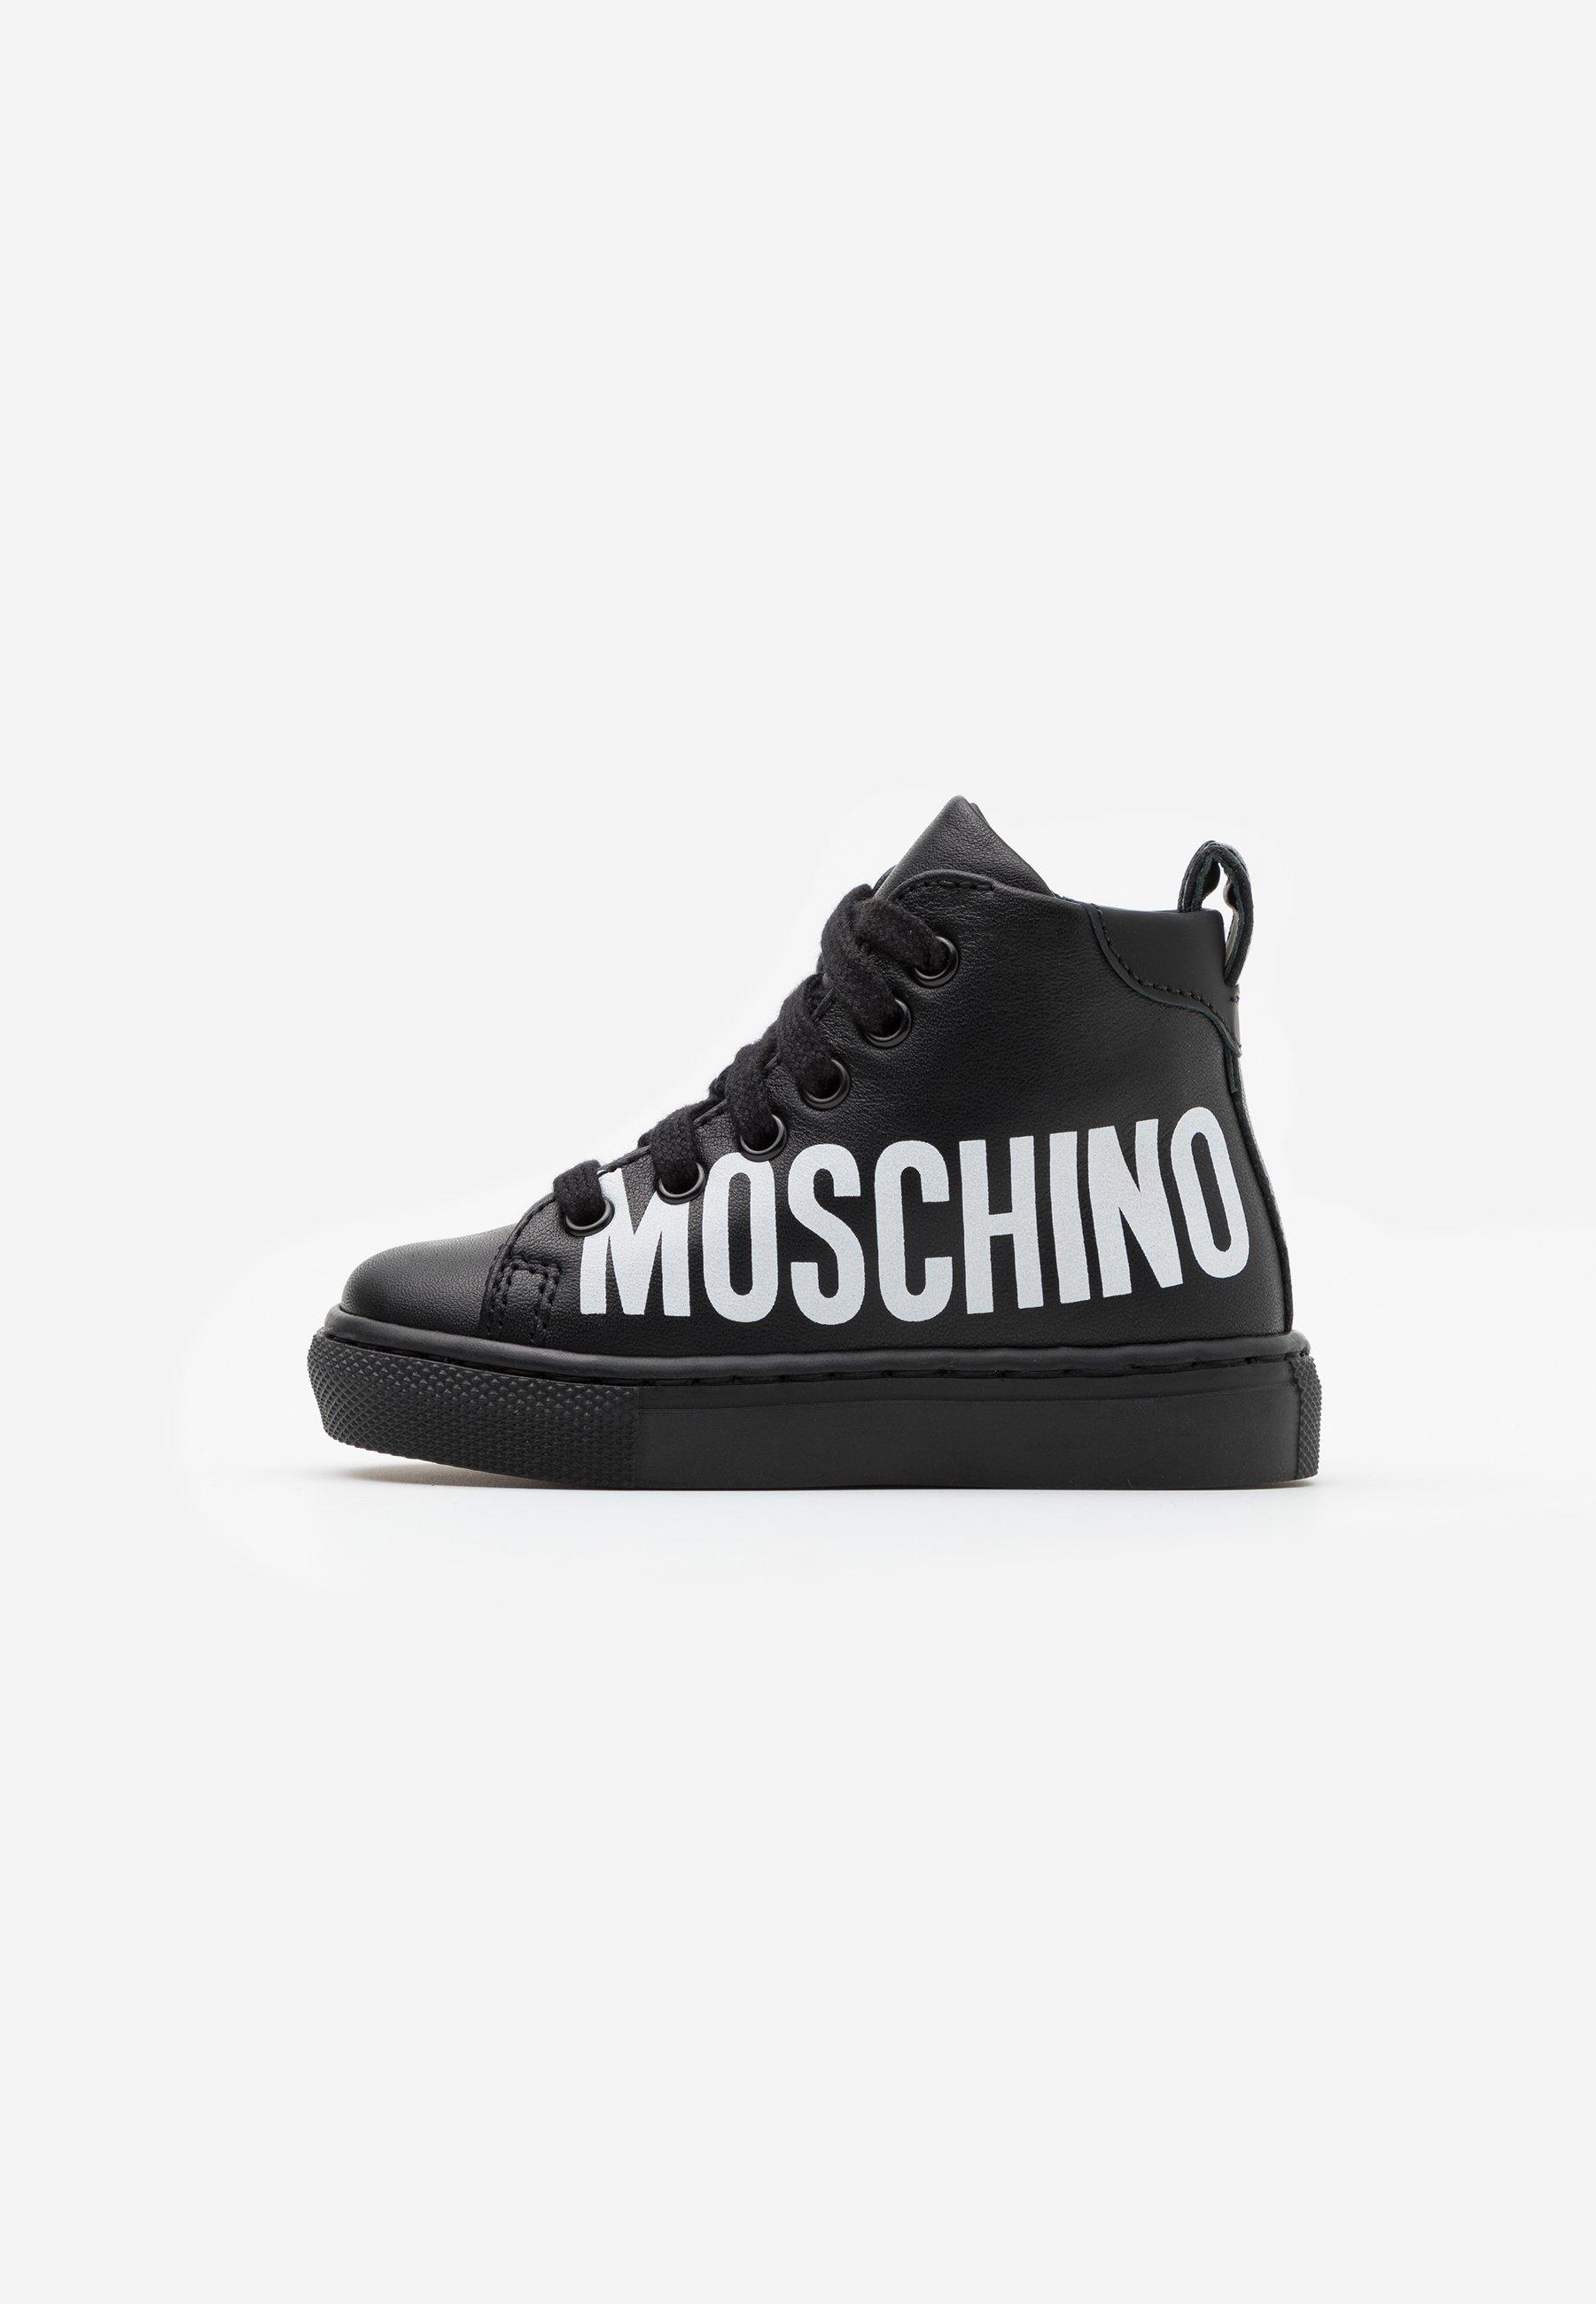 MOSCHINO Sneaker high blackwhite